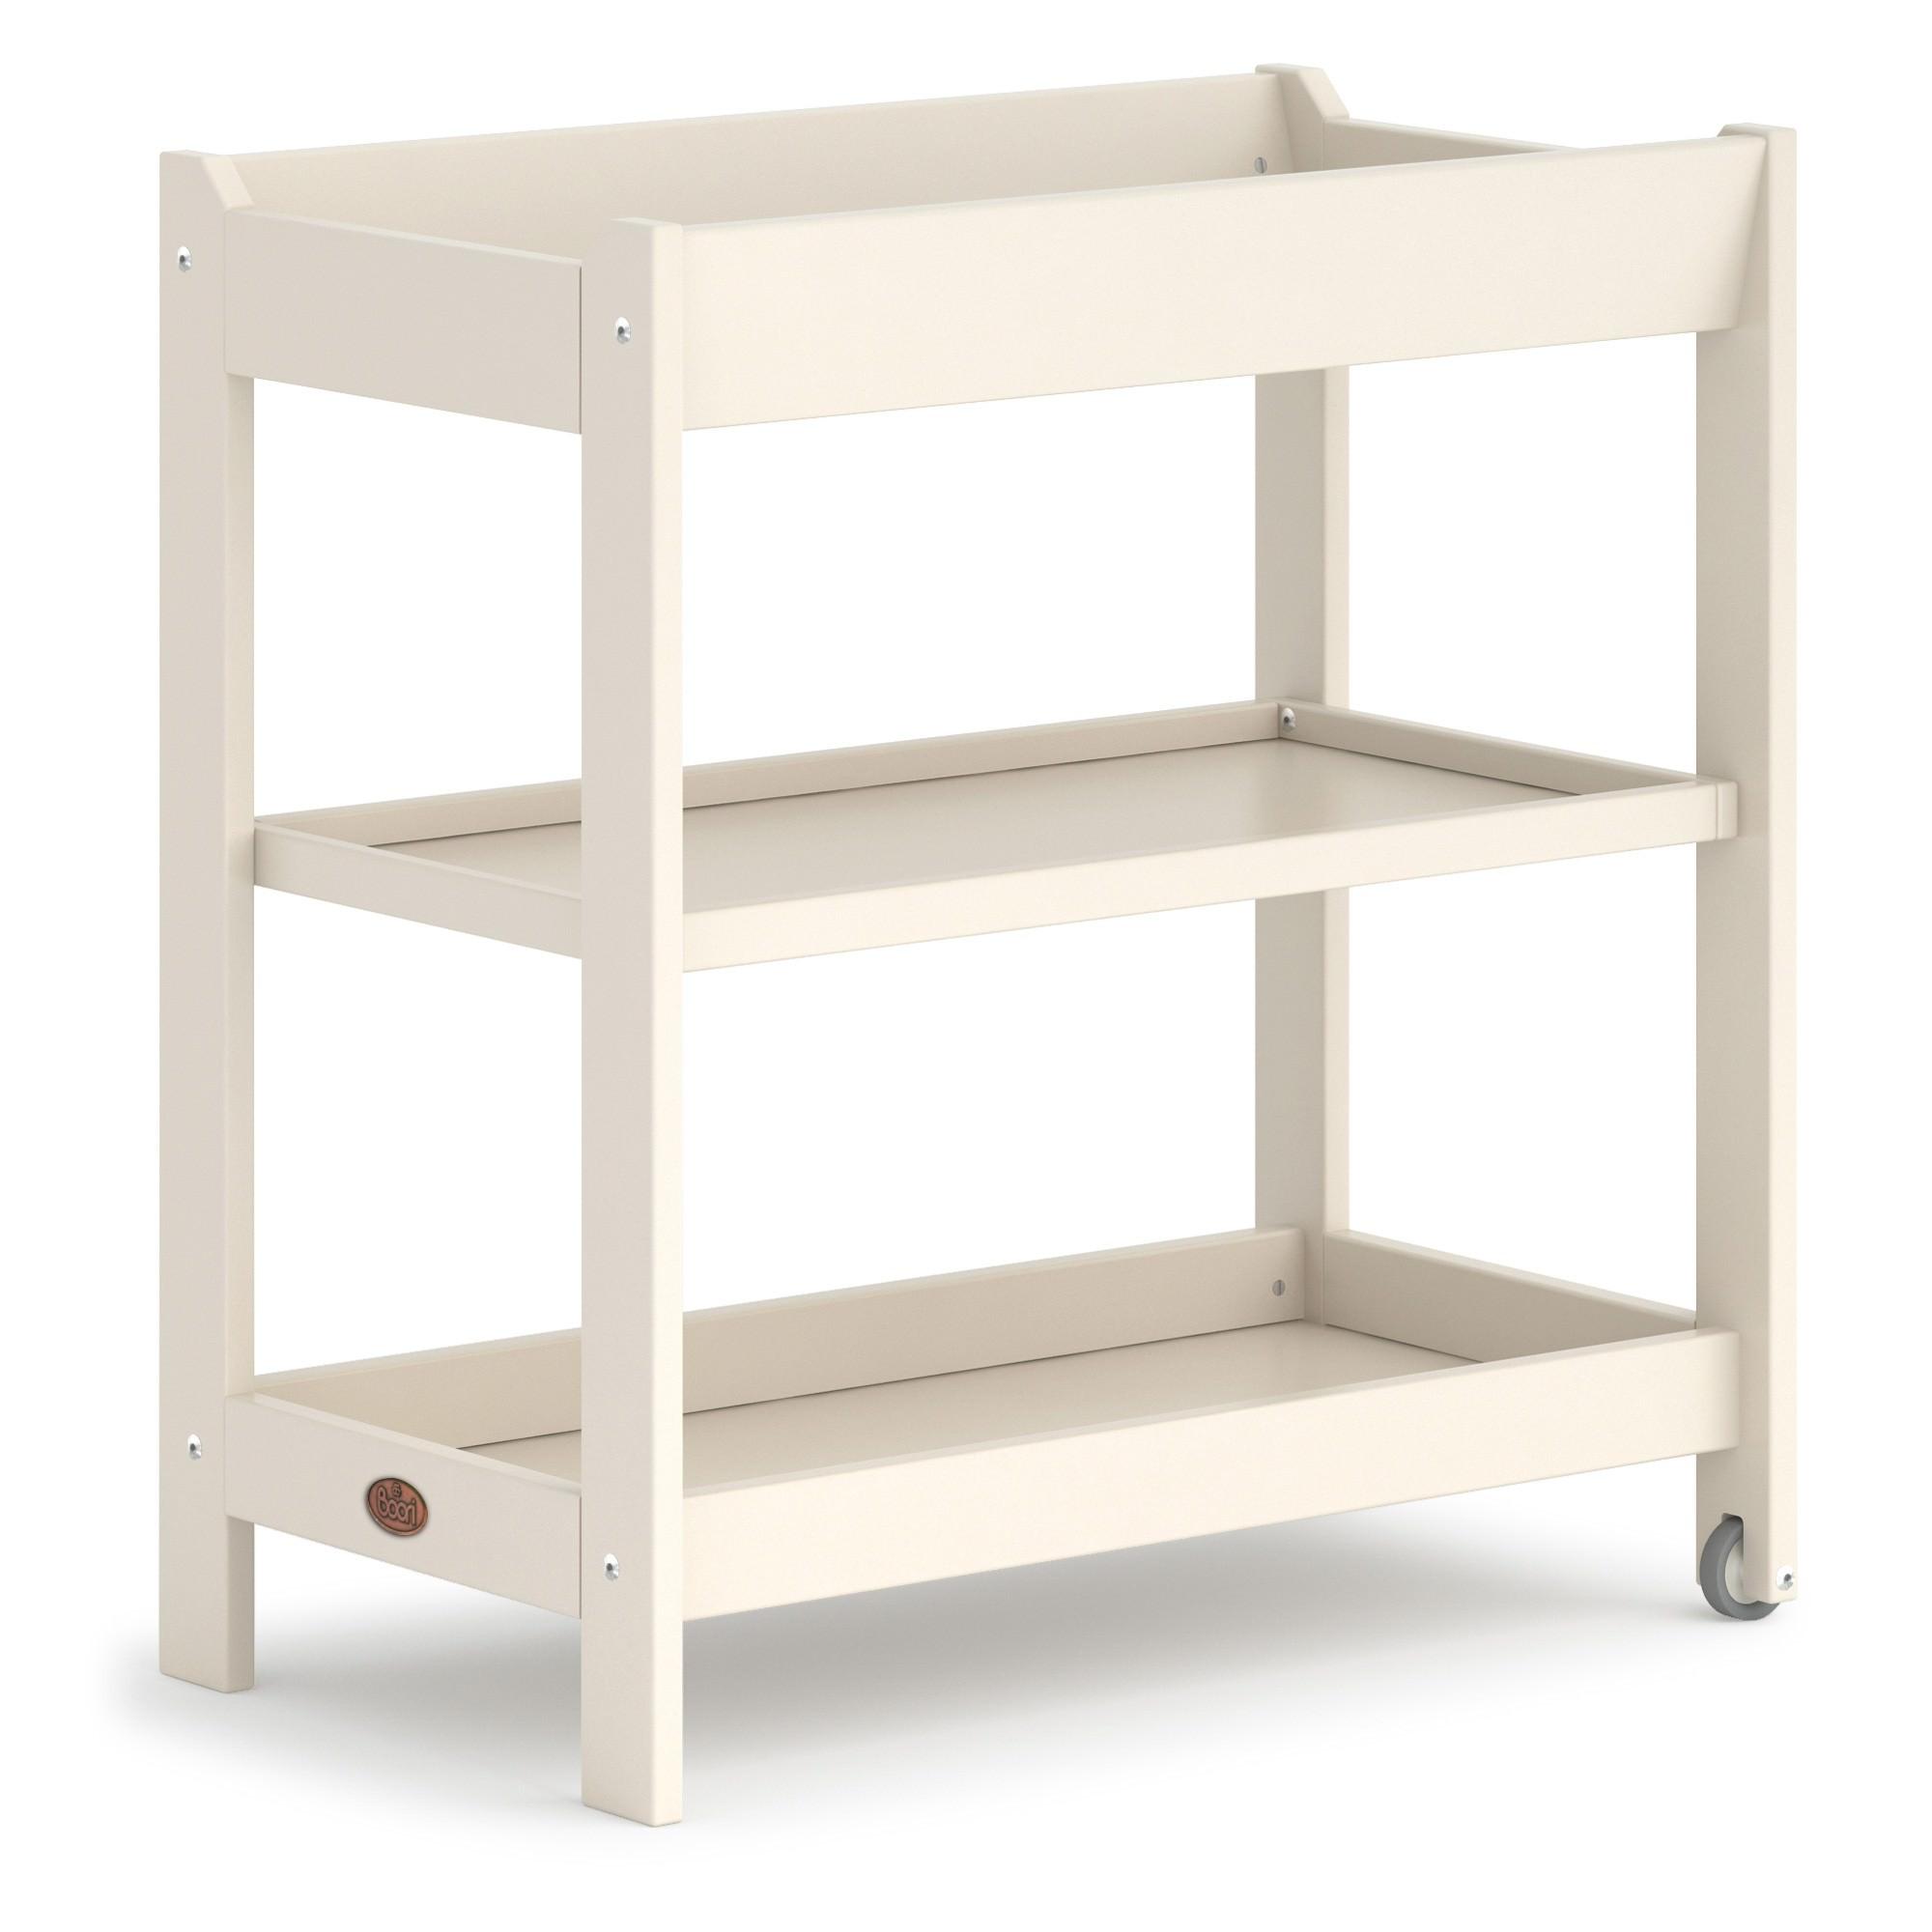 Boori Universal Wooden 3 Tier Change Table, Cream